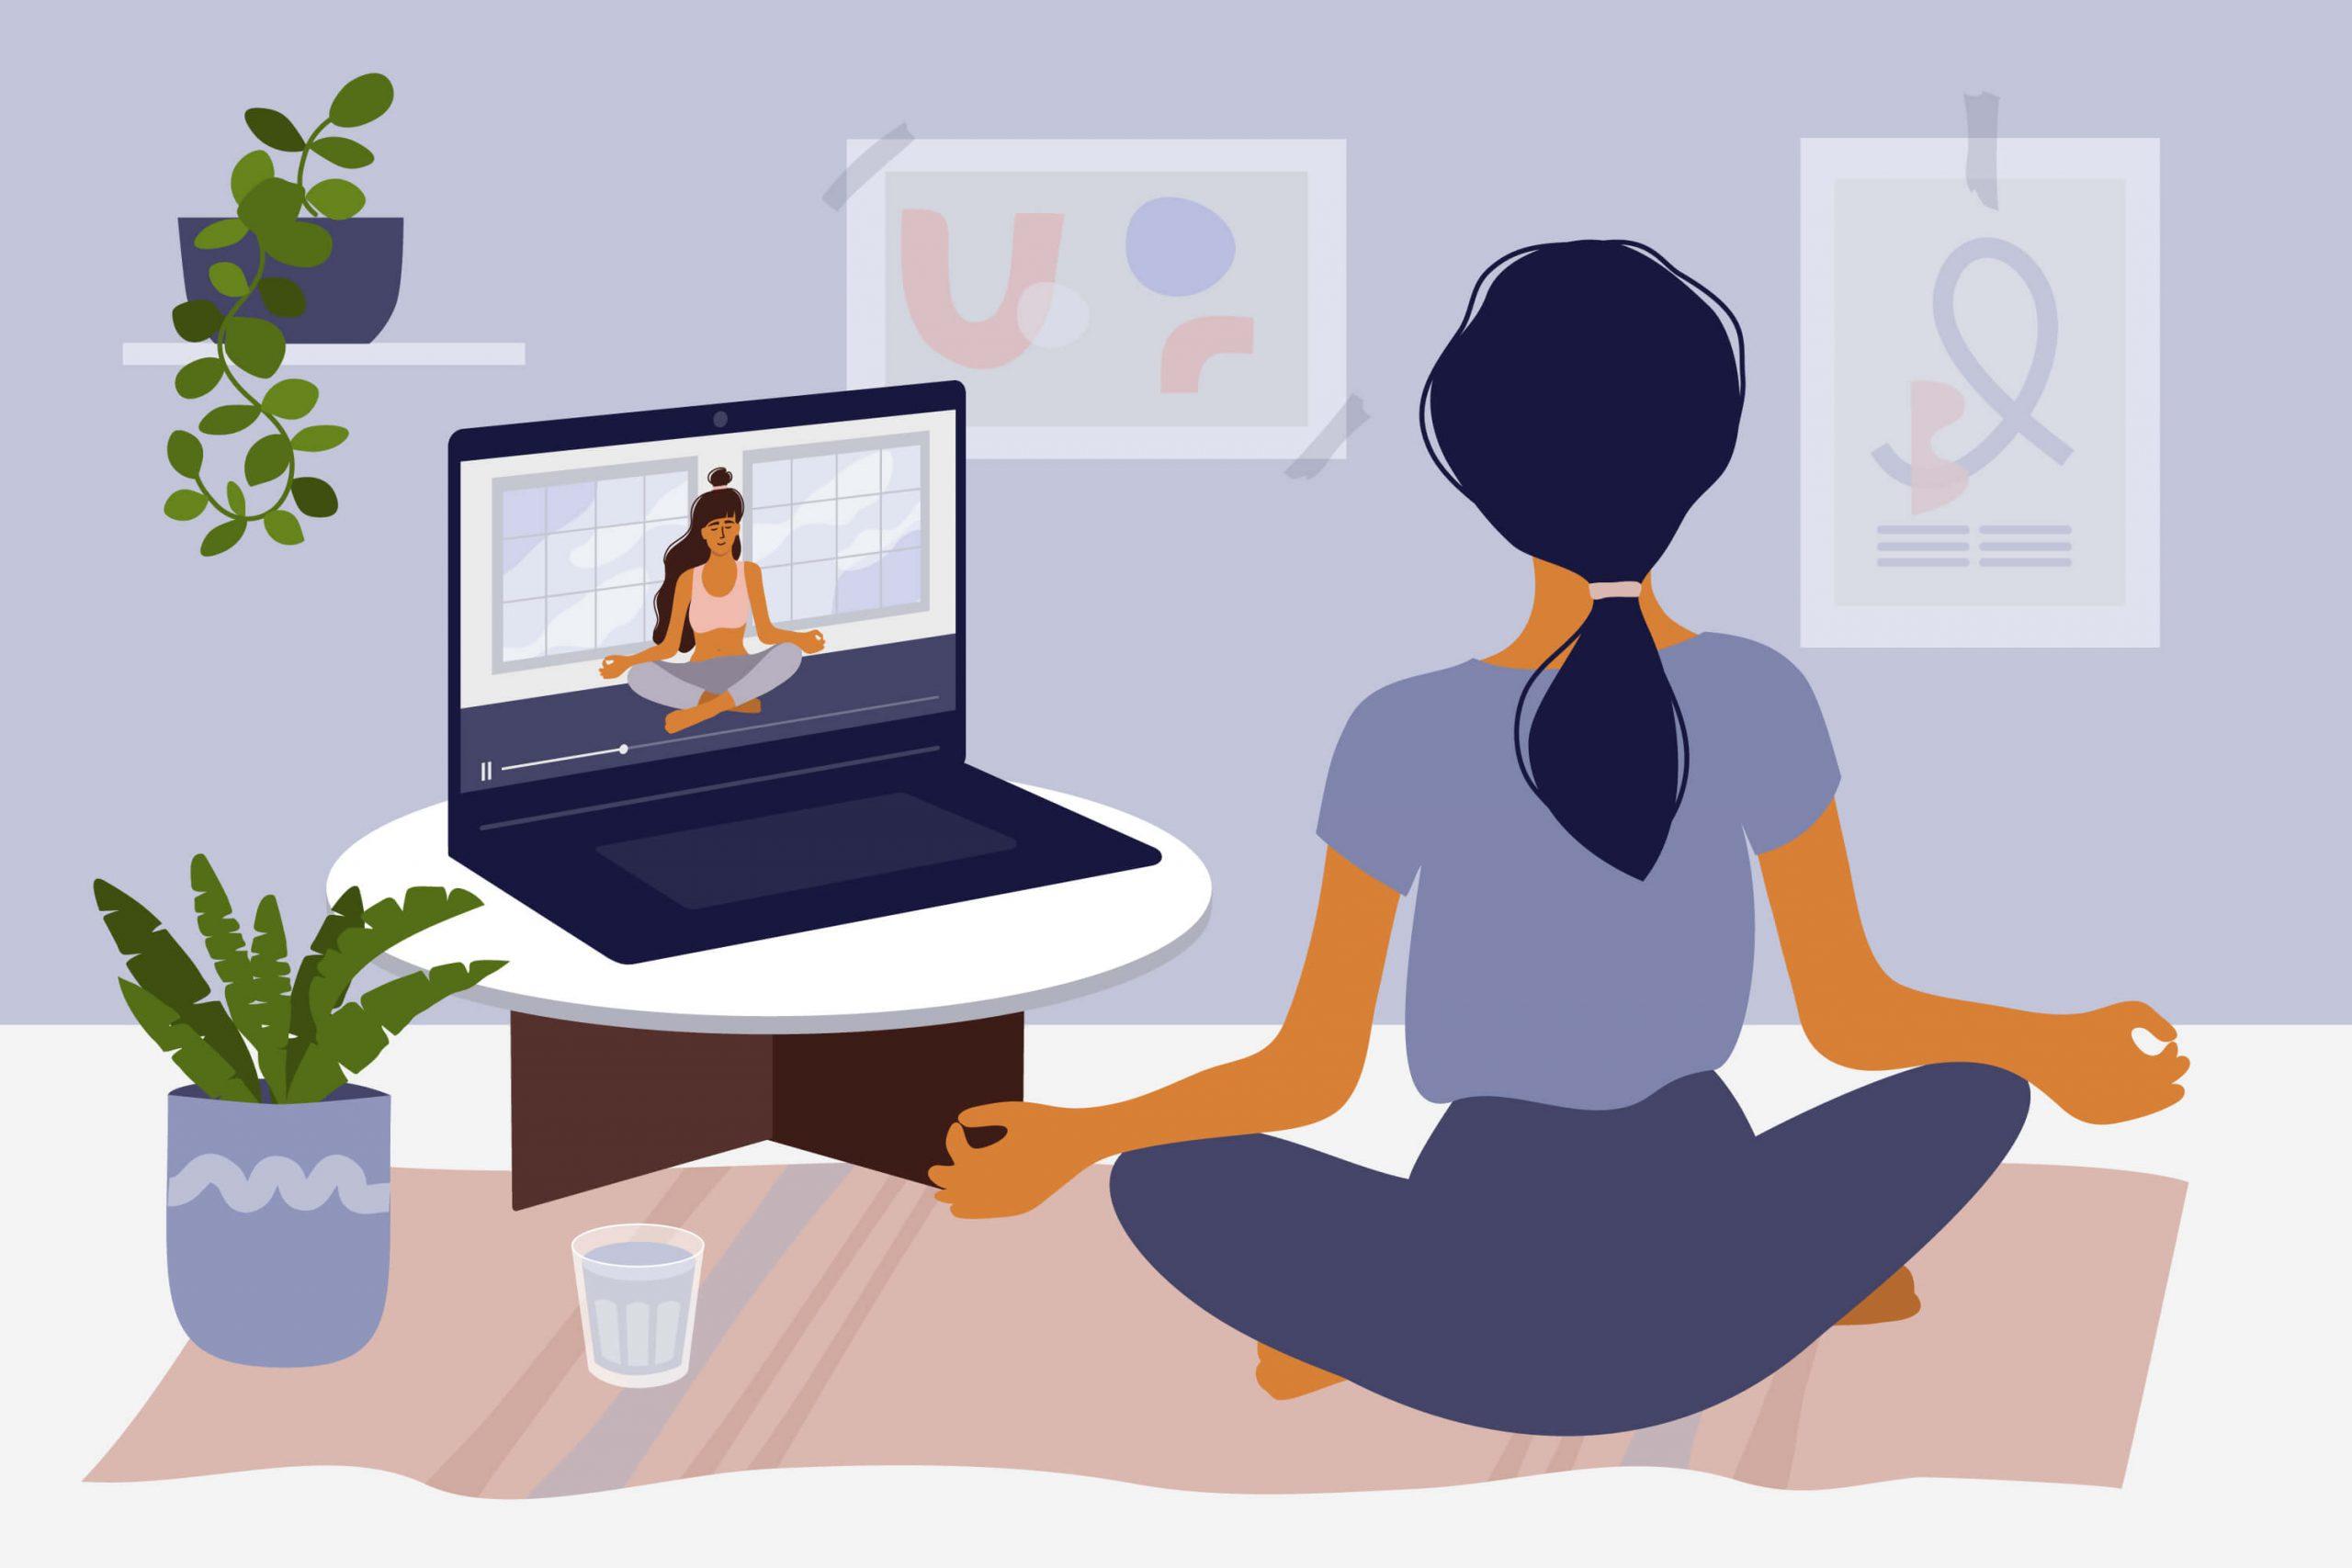 animated image of woman practicing virtual yoga